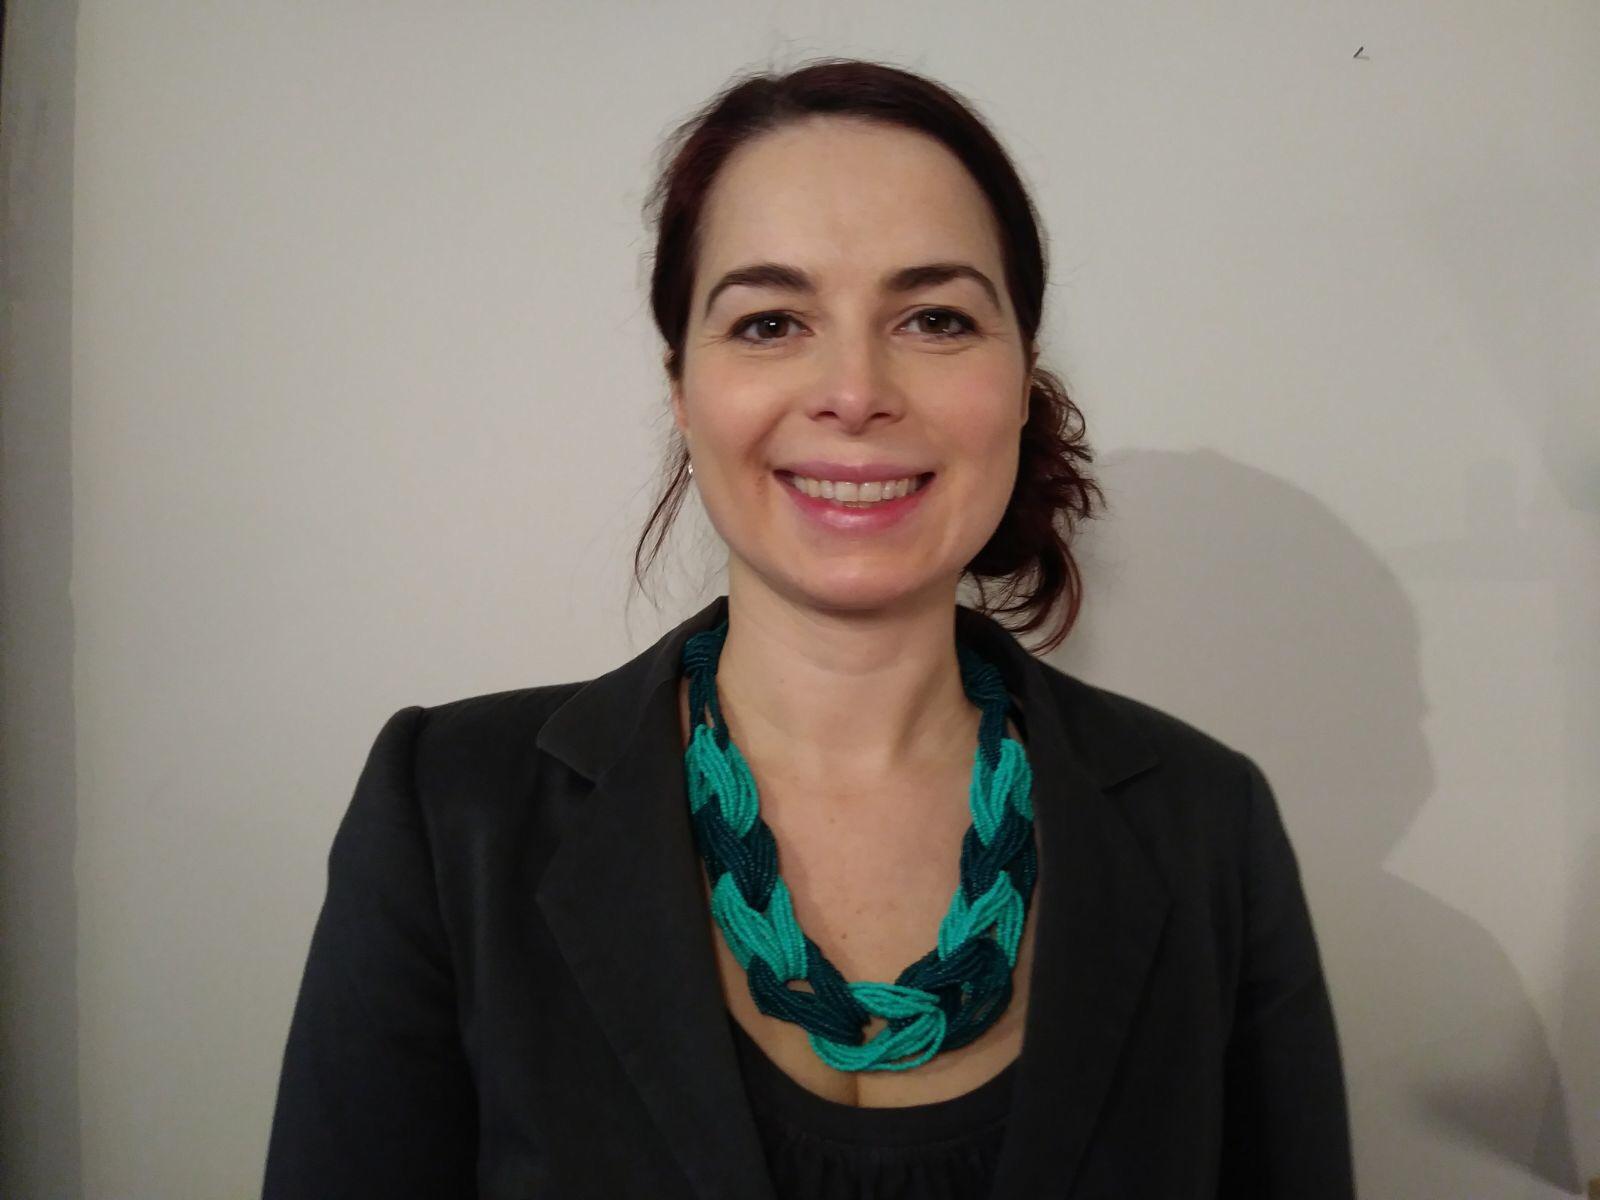 Natascha Vogel